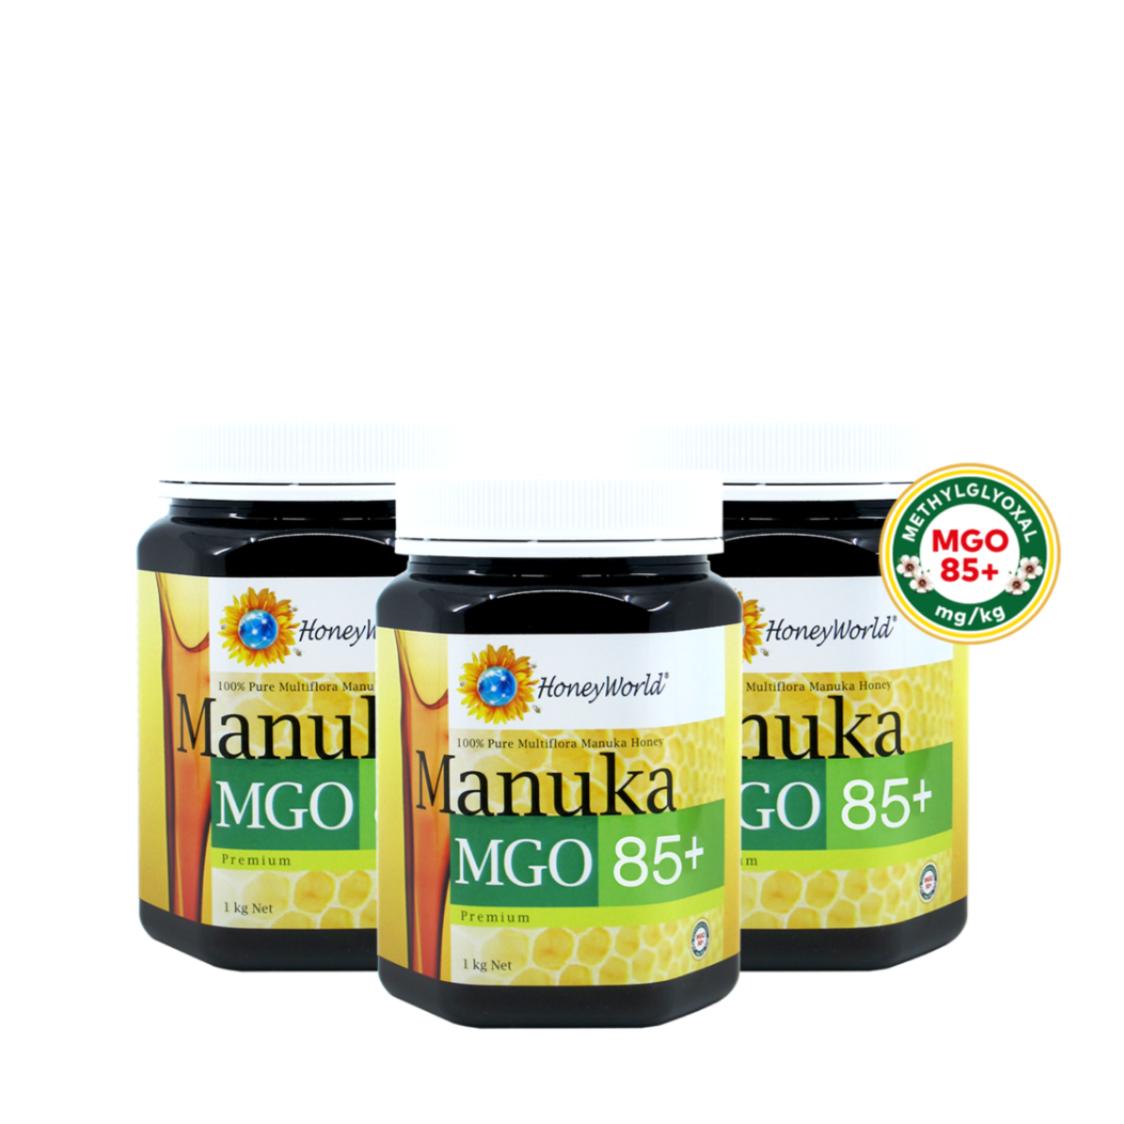 Honeyworld Manuka MGO 85 1kg Triple Pack